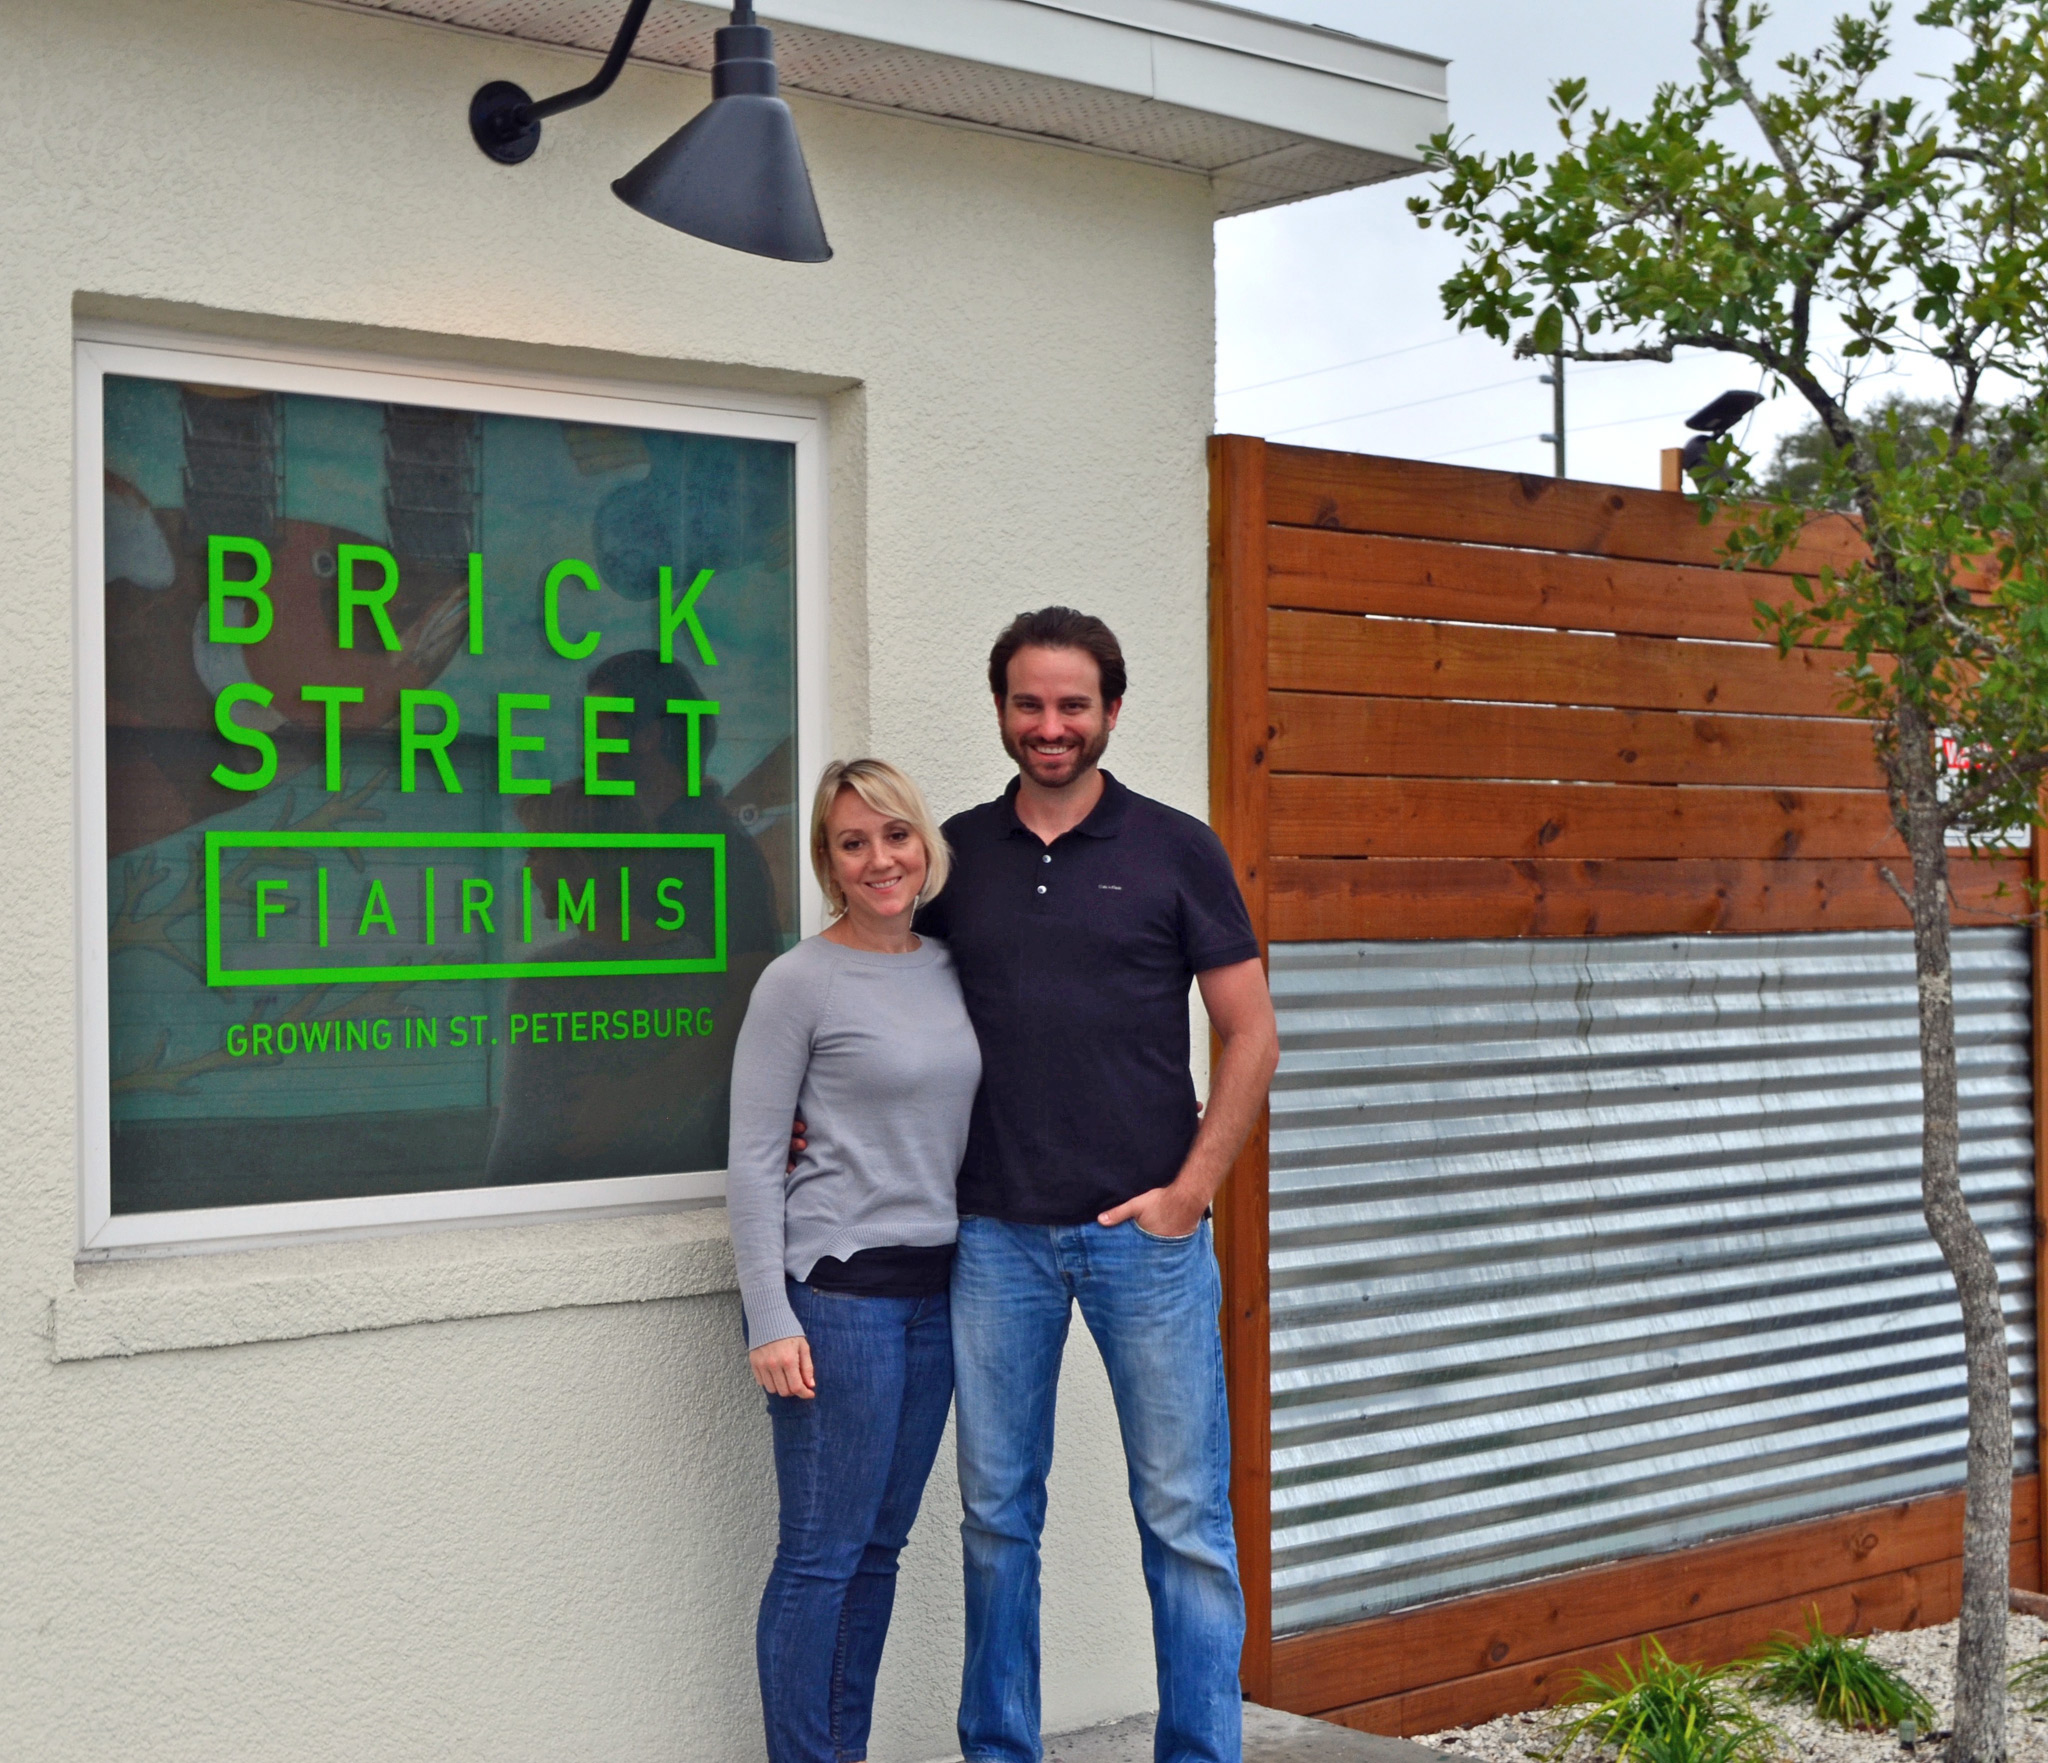 Brick Street Farm Owners Owners Shannon O'Malley & Bradley Doyle